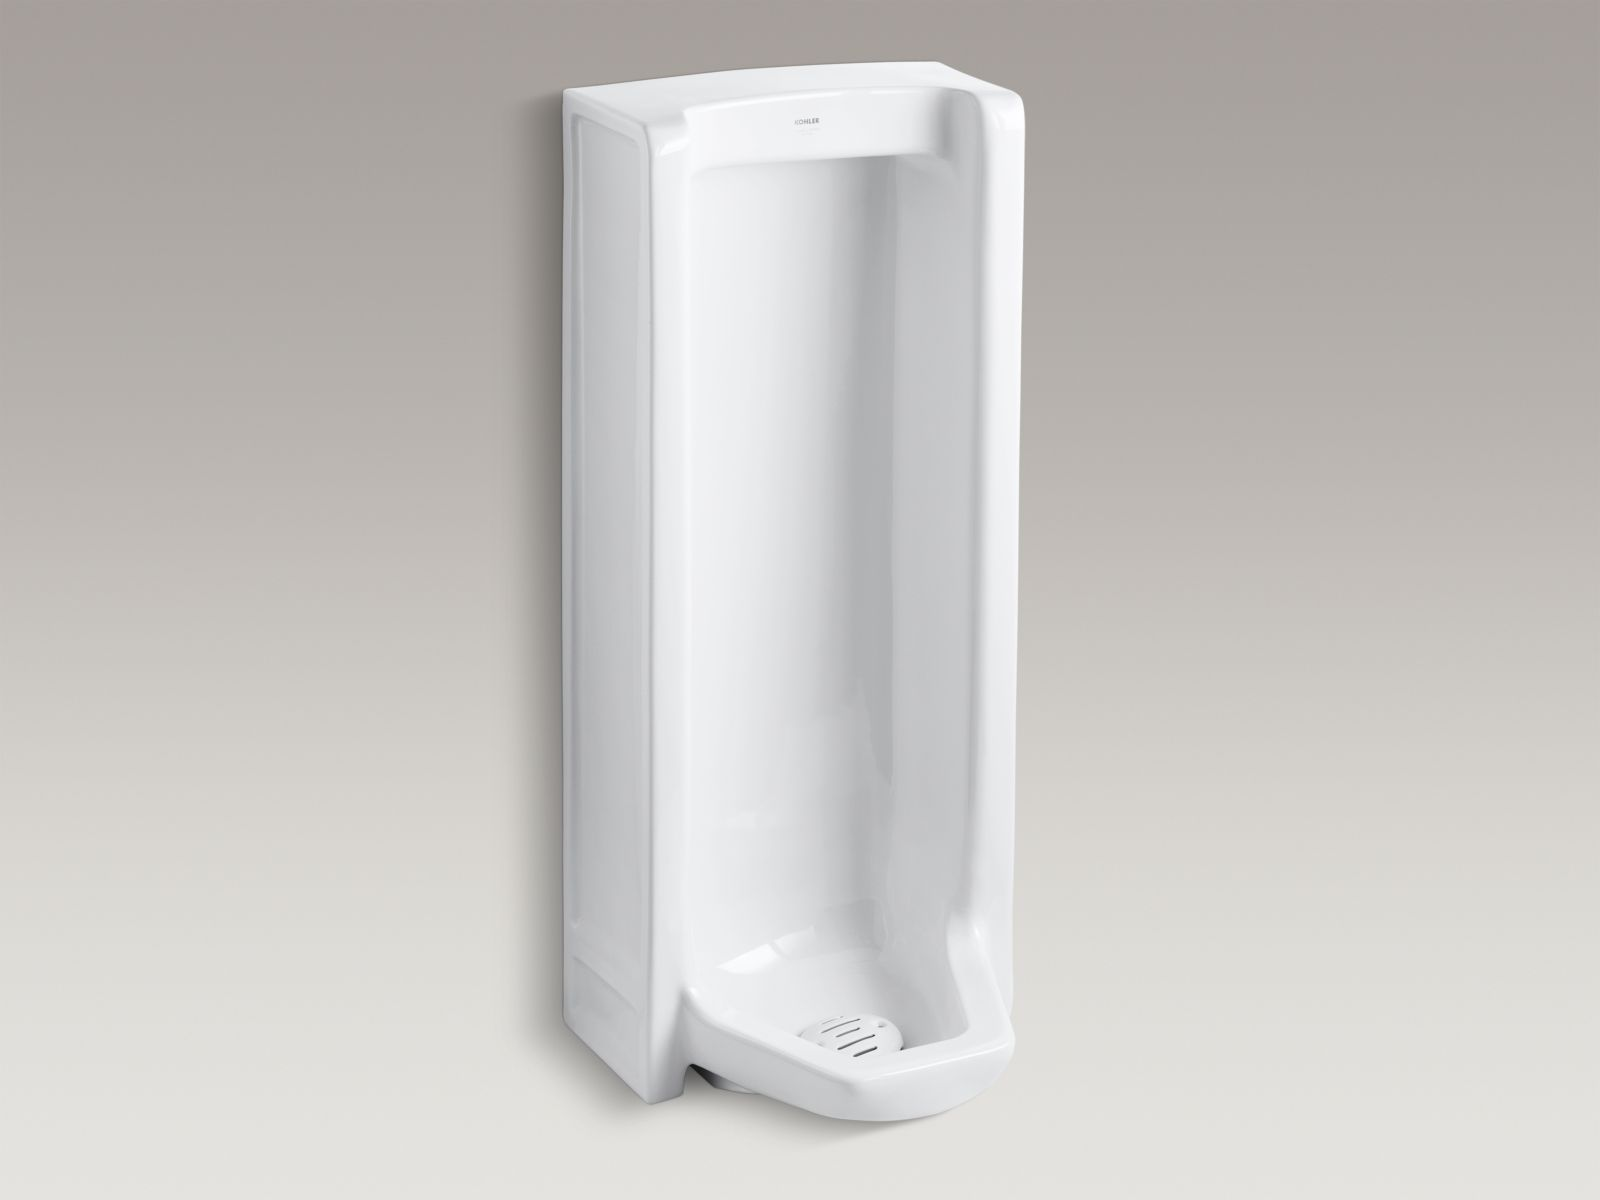 Kohler K-4920-R-0 Branham Floor-mounted 1 GPF Washout Urinal with Rear Spud White